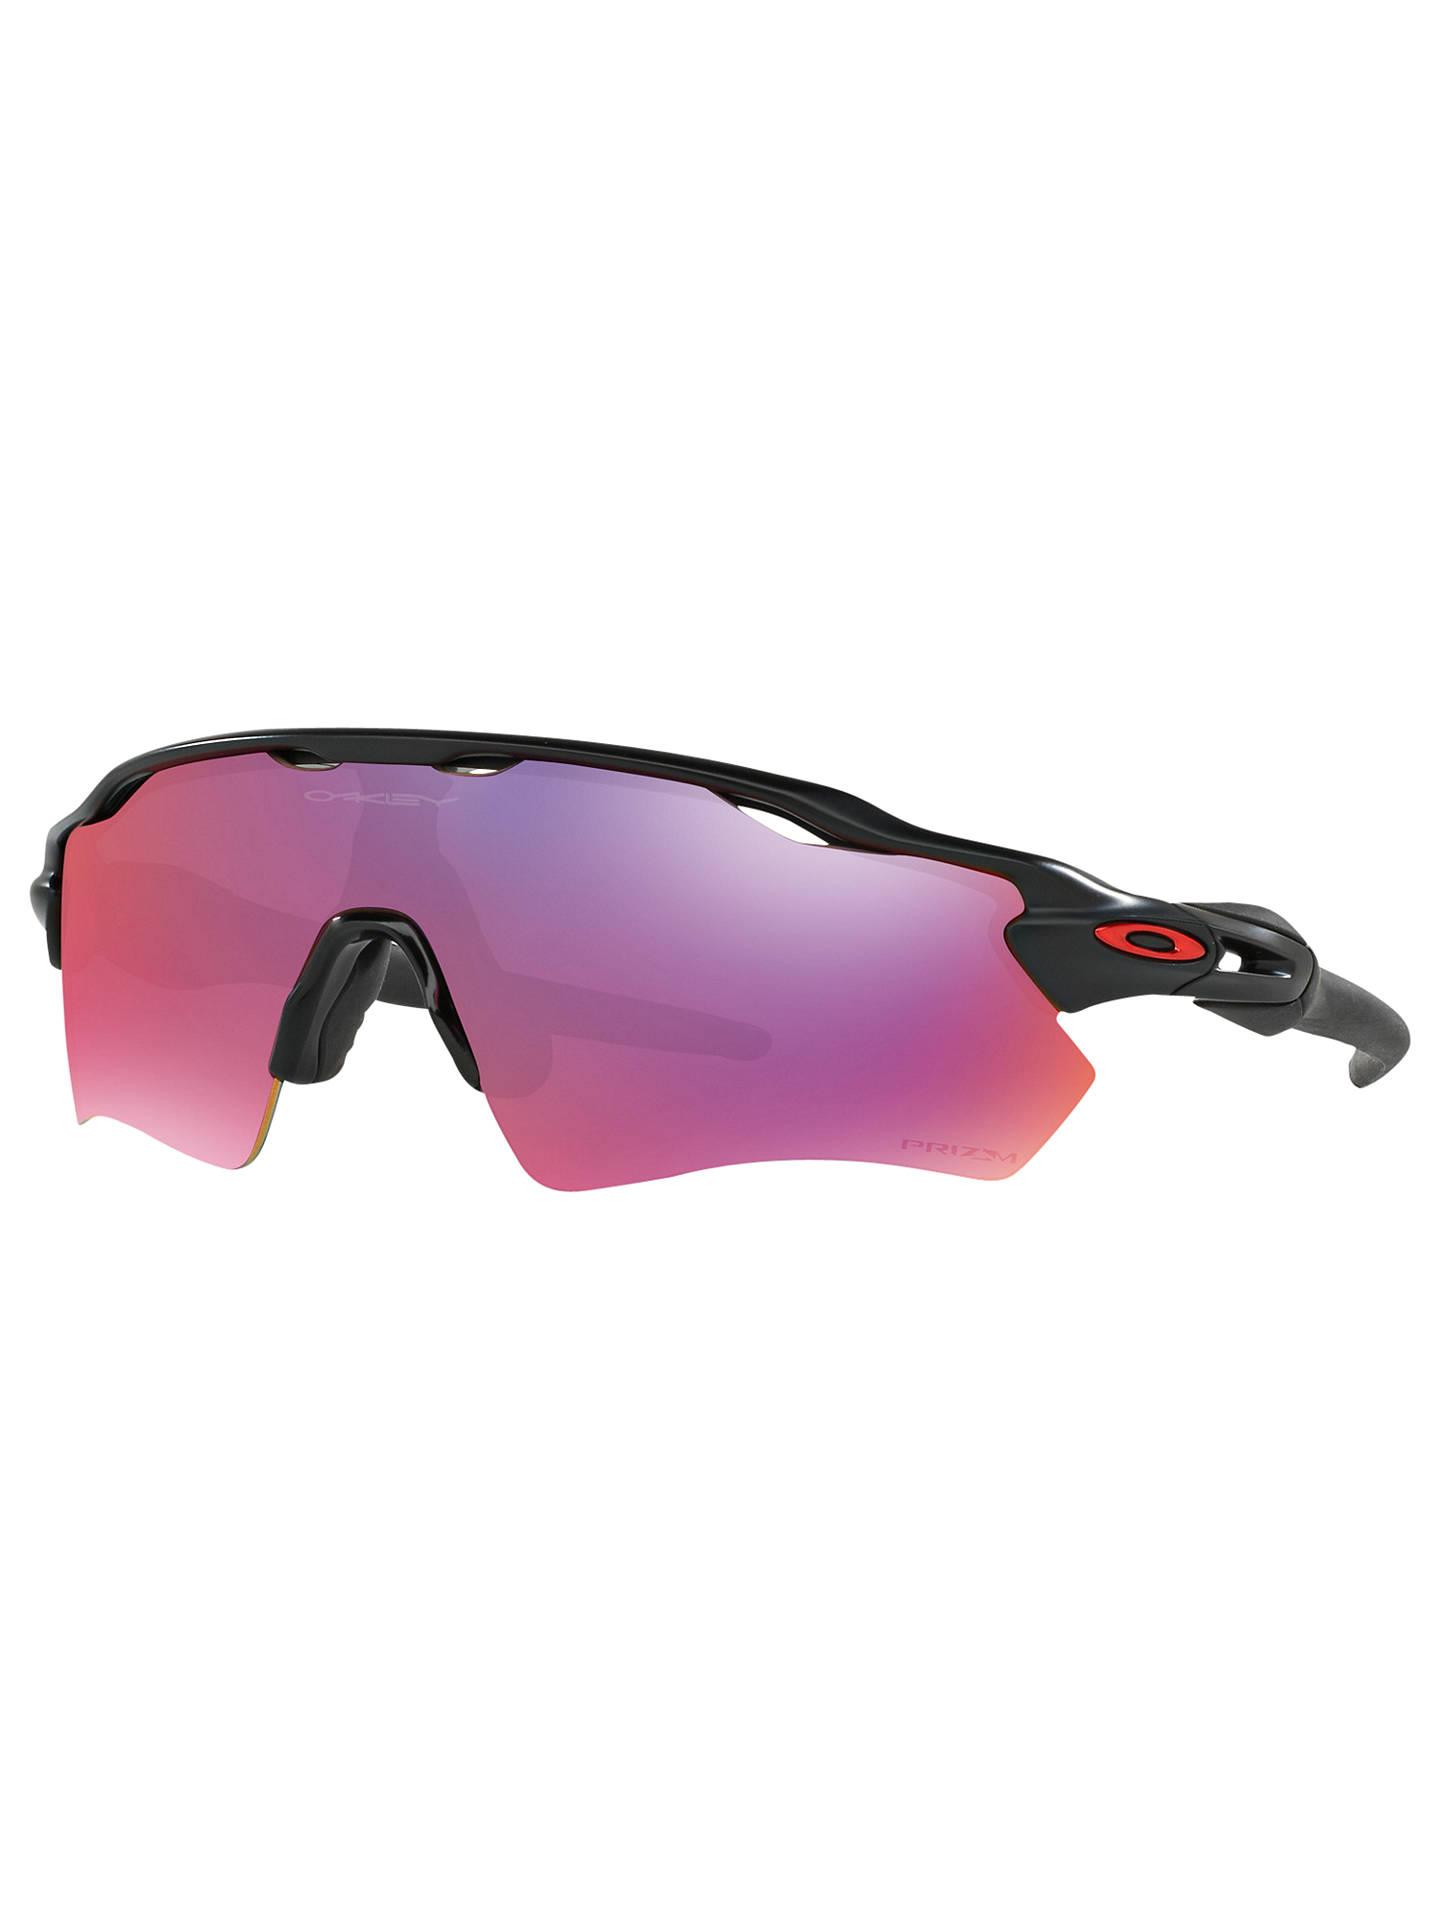 b6a53dea8adff Buy Oakley OO9208 Radar EV Path Prizm Road Wrap Sunglasses